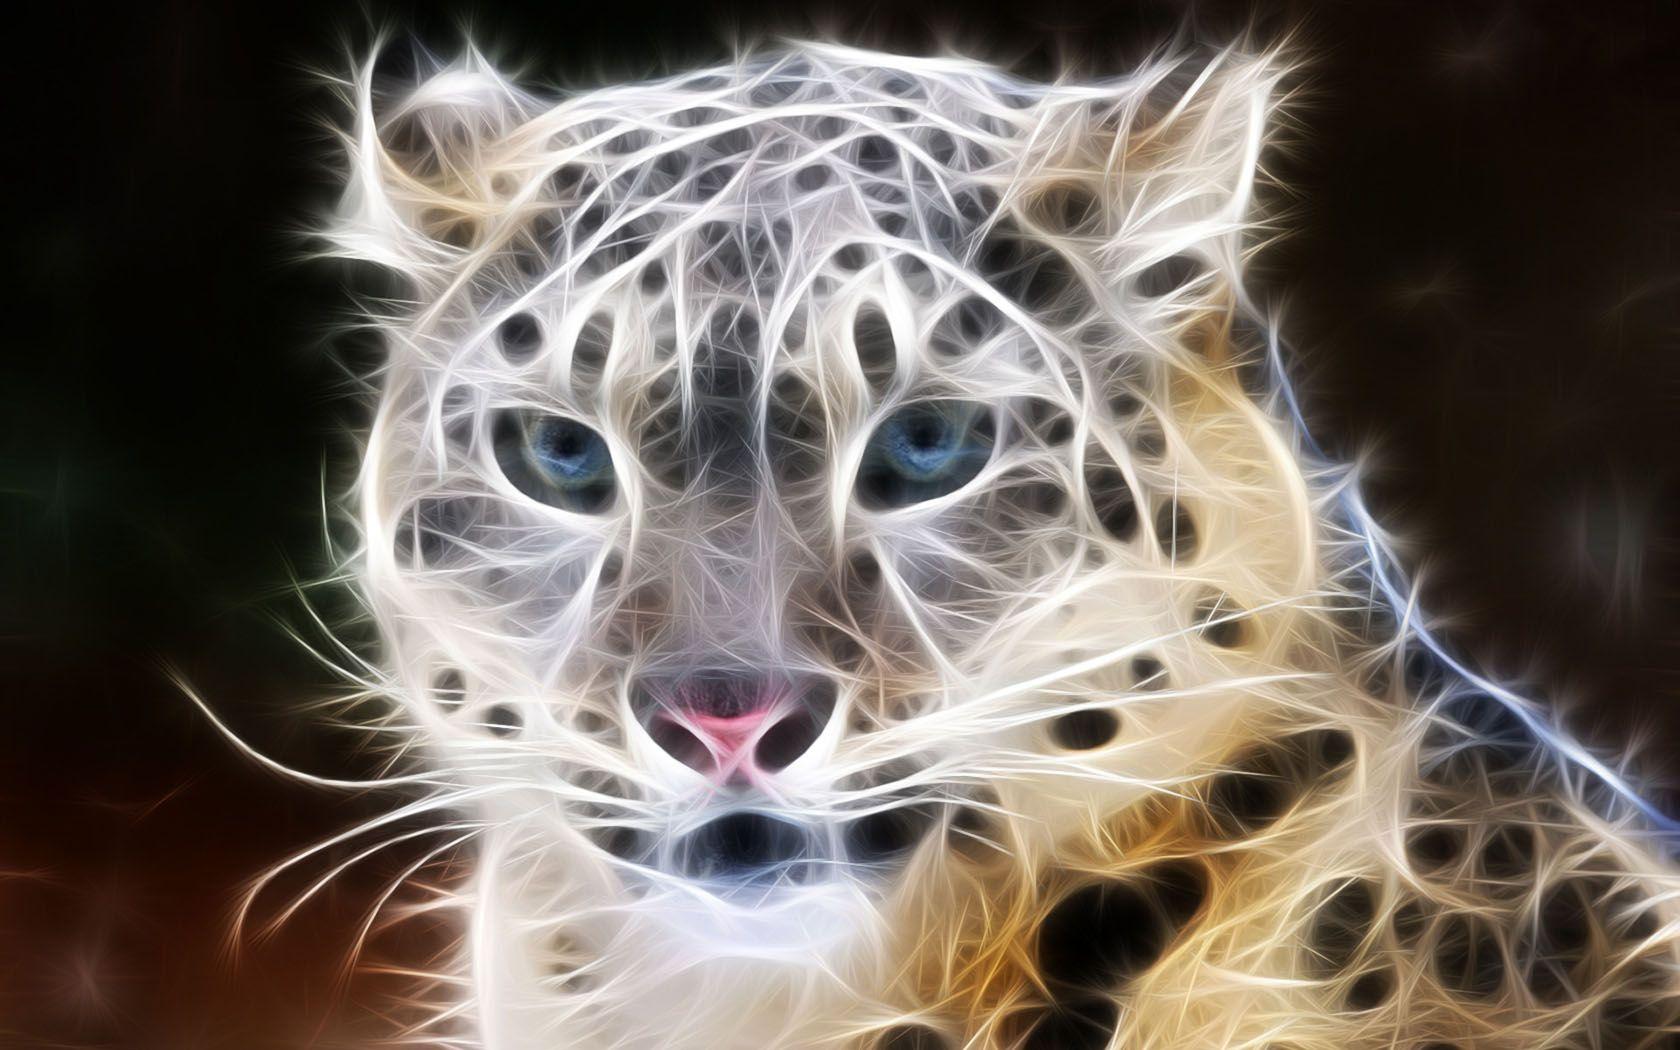 Digital Animals 3d And Digital Art Wallpaper Http Www Shareyourwallpaper Com 3d And Digital Art Digital Animals Show 29237 Fractal Art Art Airbrush Art